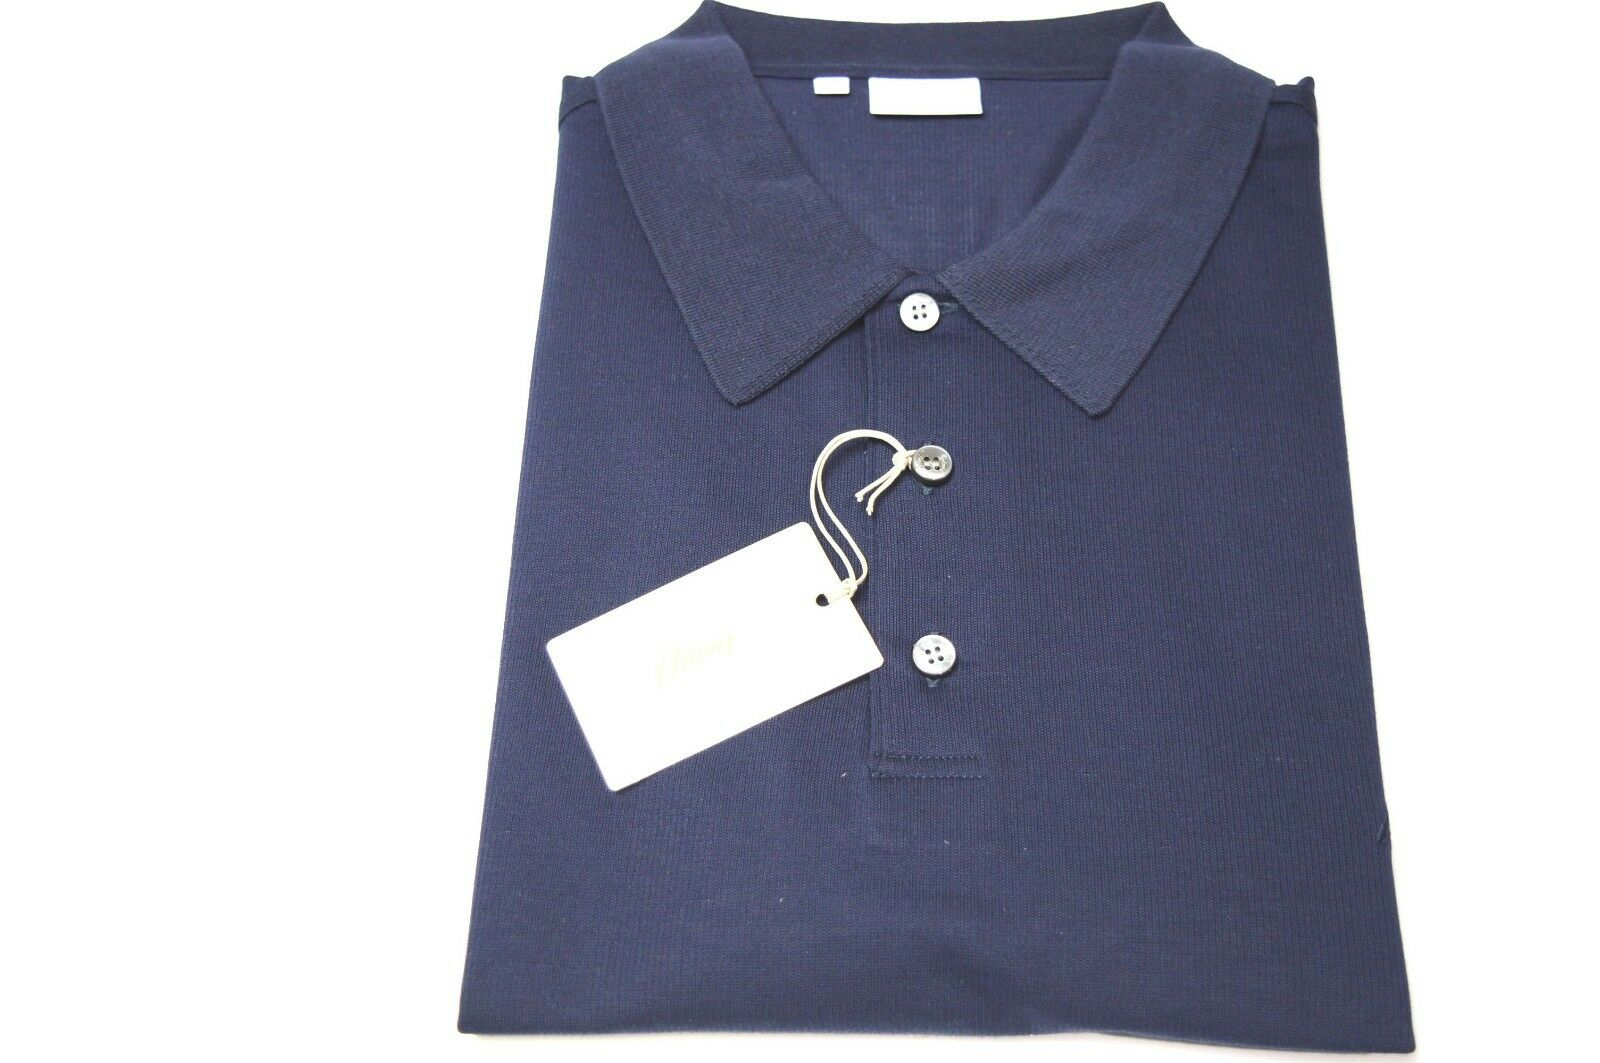 NEW  BRIONI Polo Zip  Short Sleeve Cotton Größe  Us 2XL  Eu 56 (SP31)